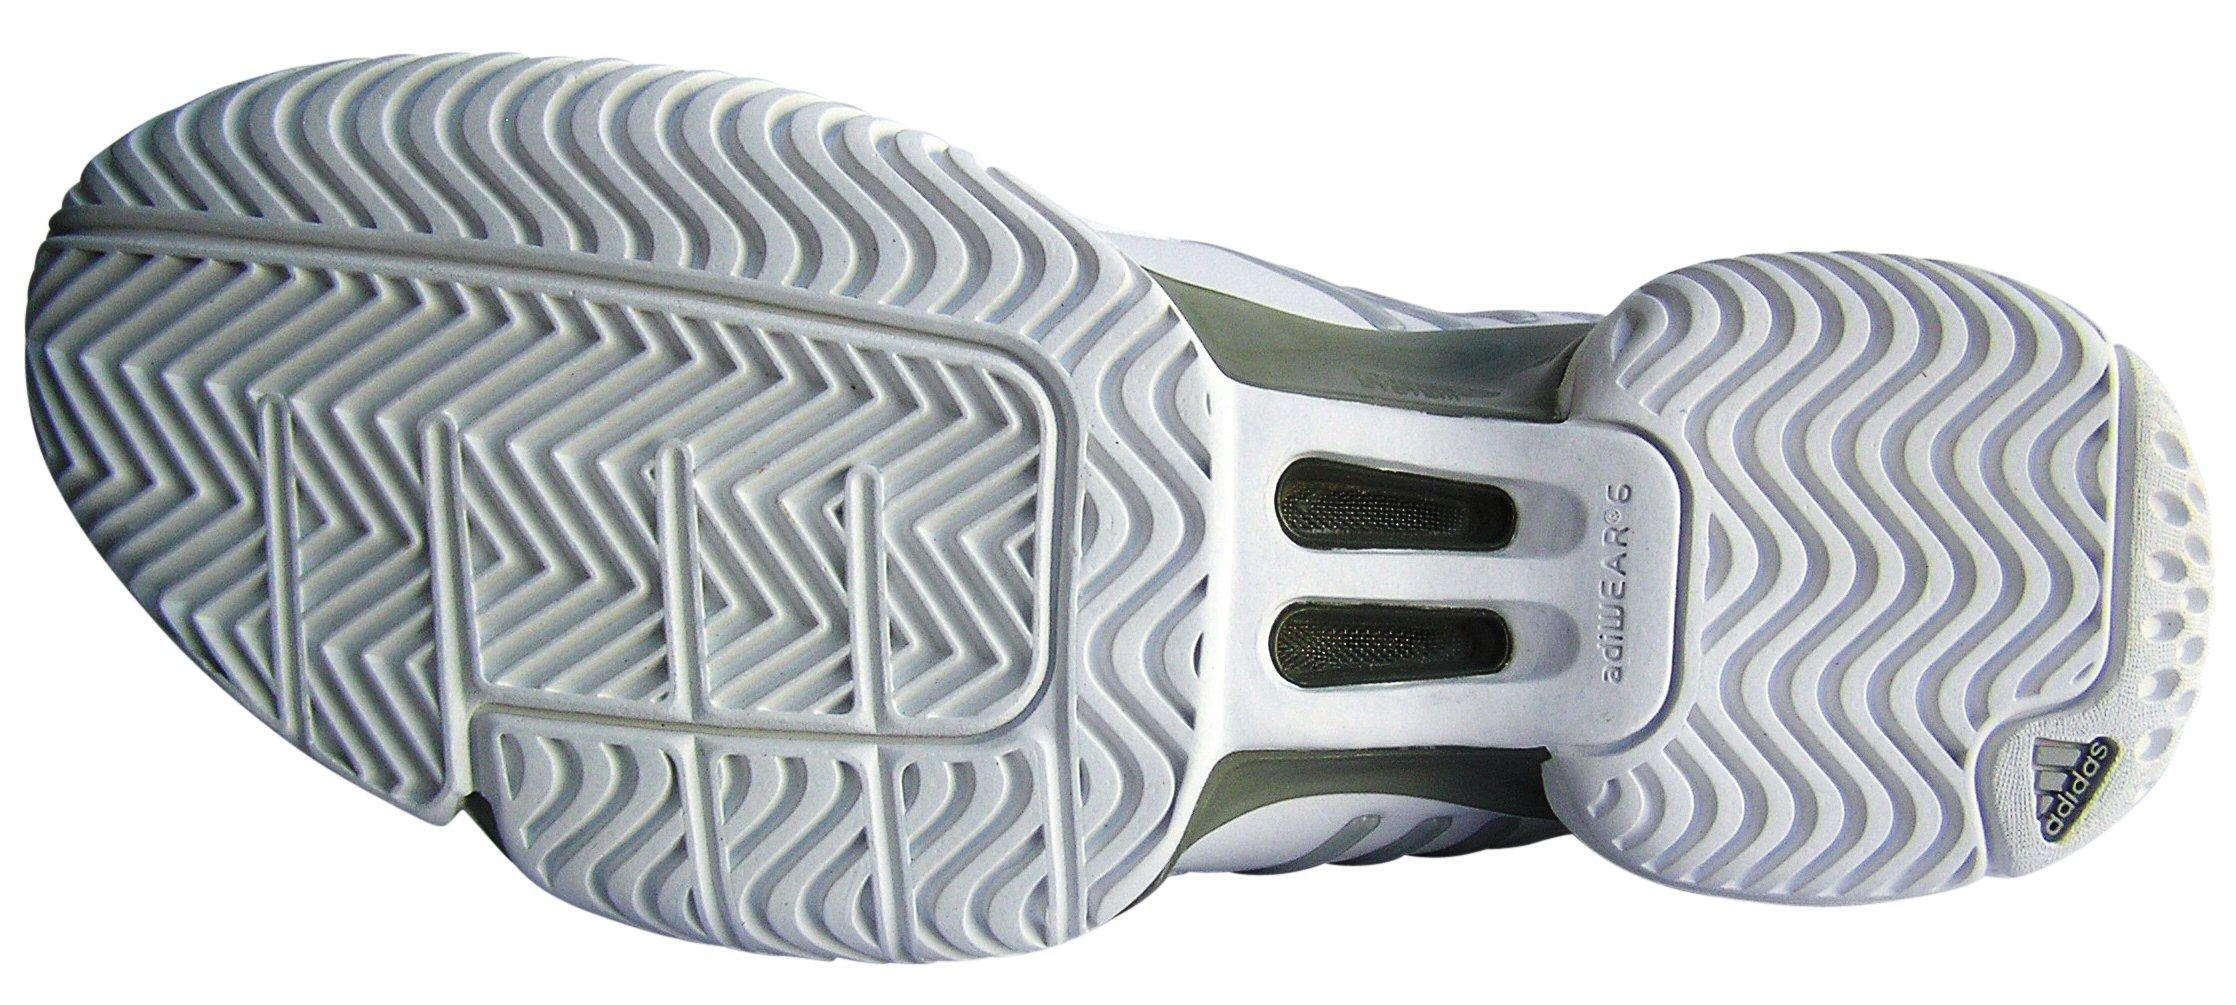 CC Damen II Tennisschuhe adidas Divine byv7f6gY